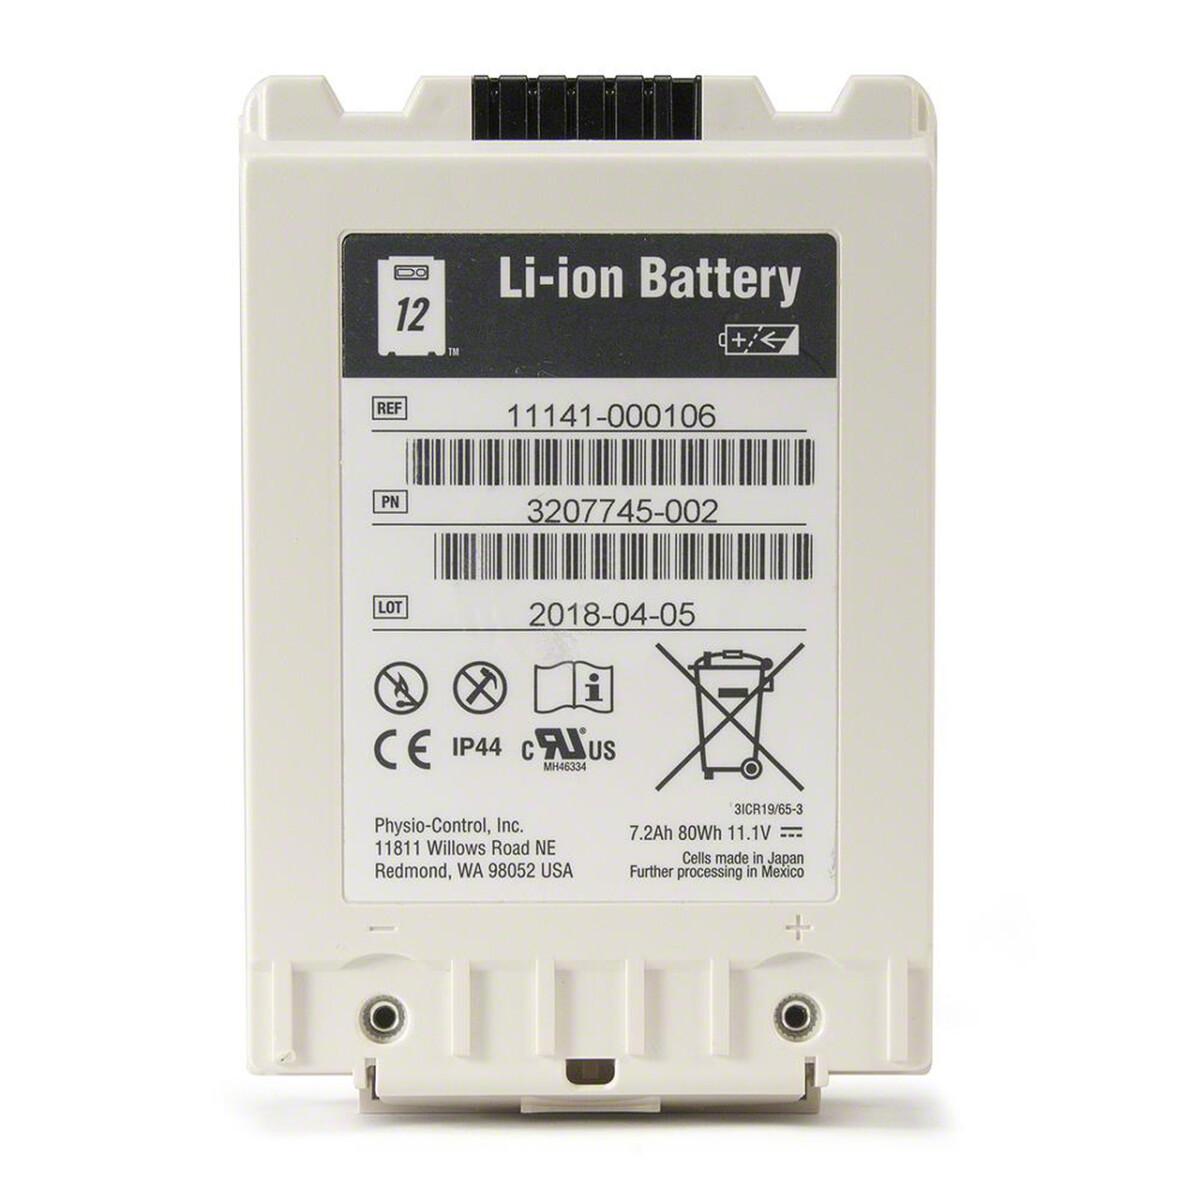 Bateria Li-ion para Lifepak 12